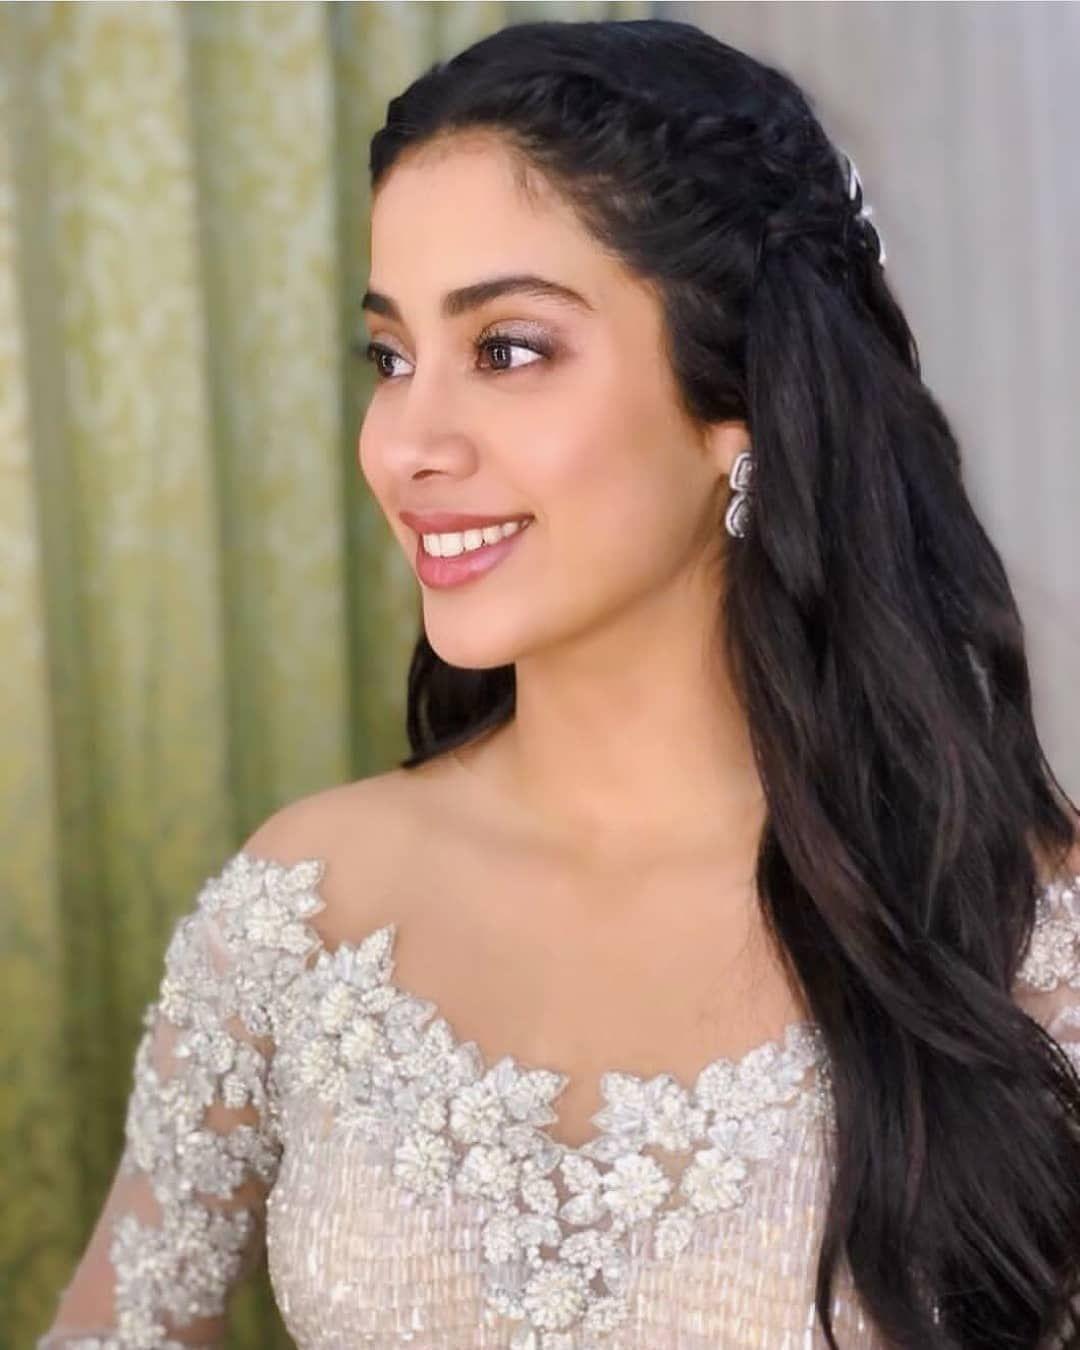 Jacqueline Fernandz And Jhanvi Kapoor At Sonam Kapoor Wedding Youtube In 2020 Sonam Kapoor Wedding Sonam Kapoor Indian Wedding Dress